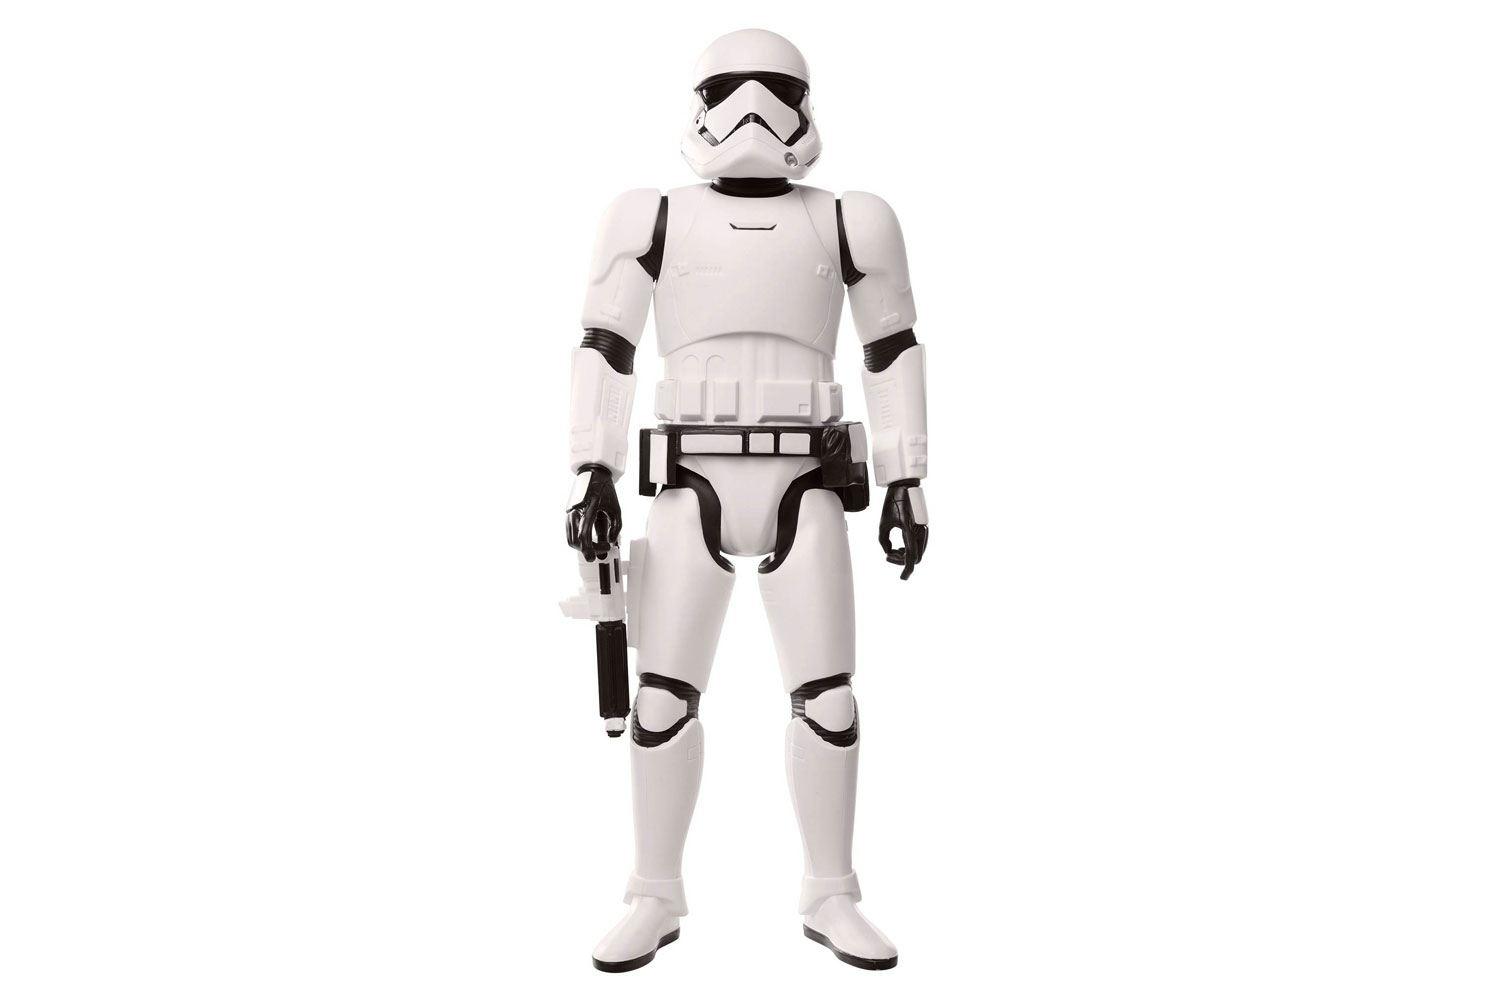 Star Wars Episode VIII Big Figs Action Figure First Order Stormtrooper 50 cm Case (6)